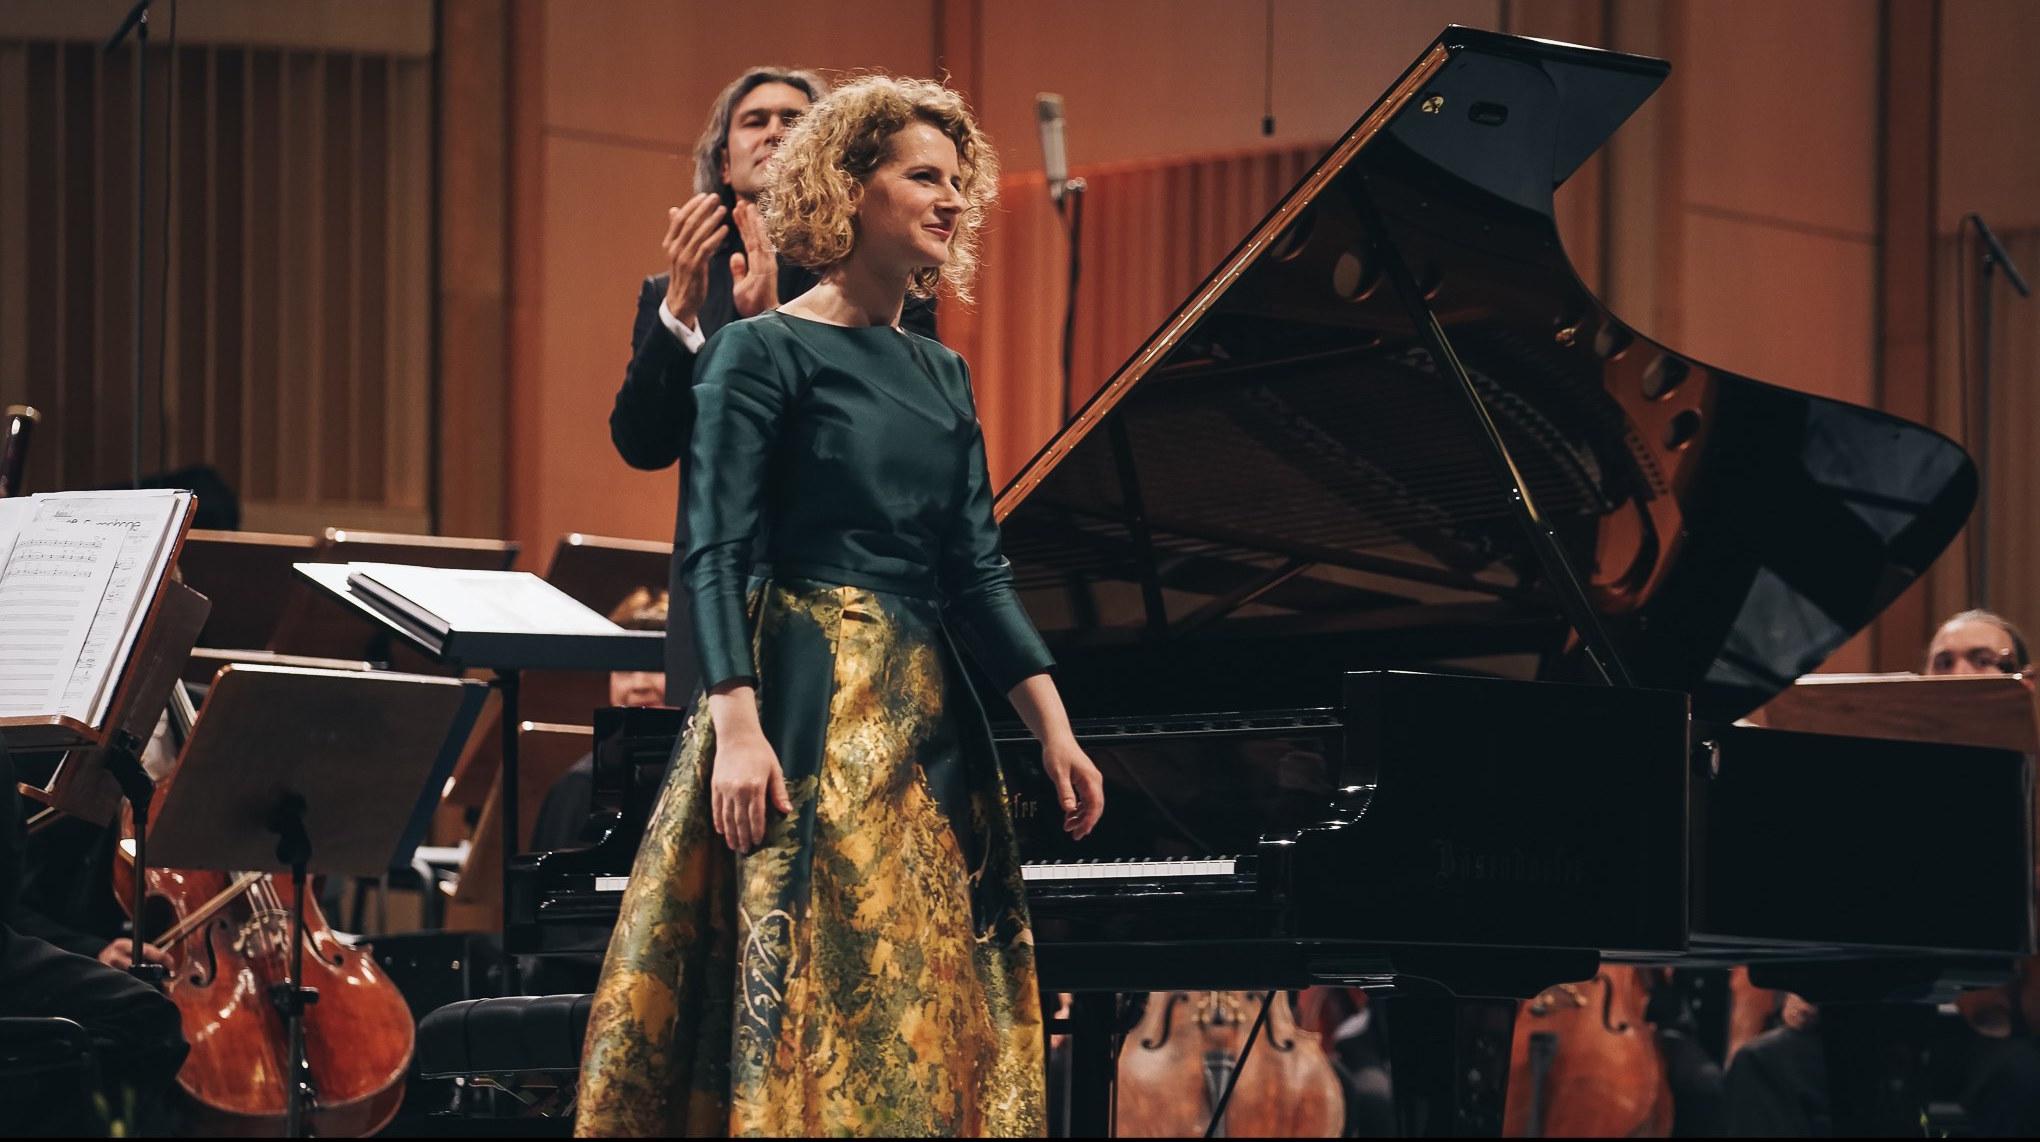 piano pianist Silocea music classical performance culture stage live Romania